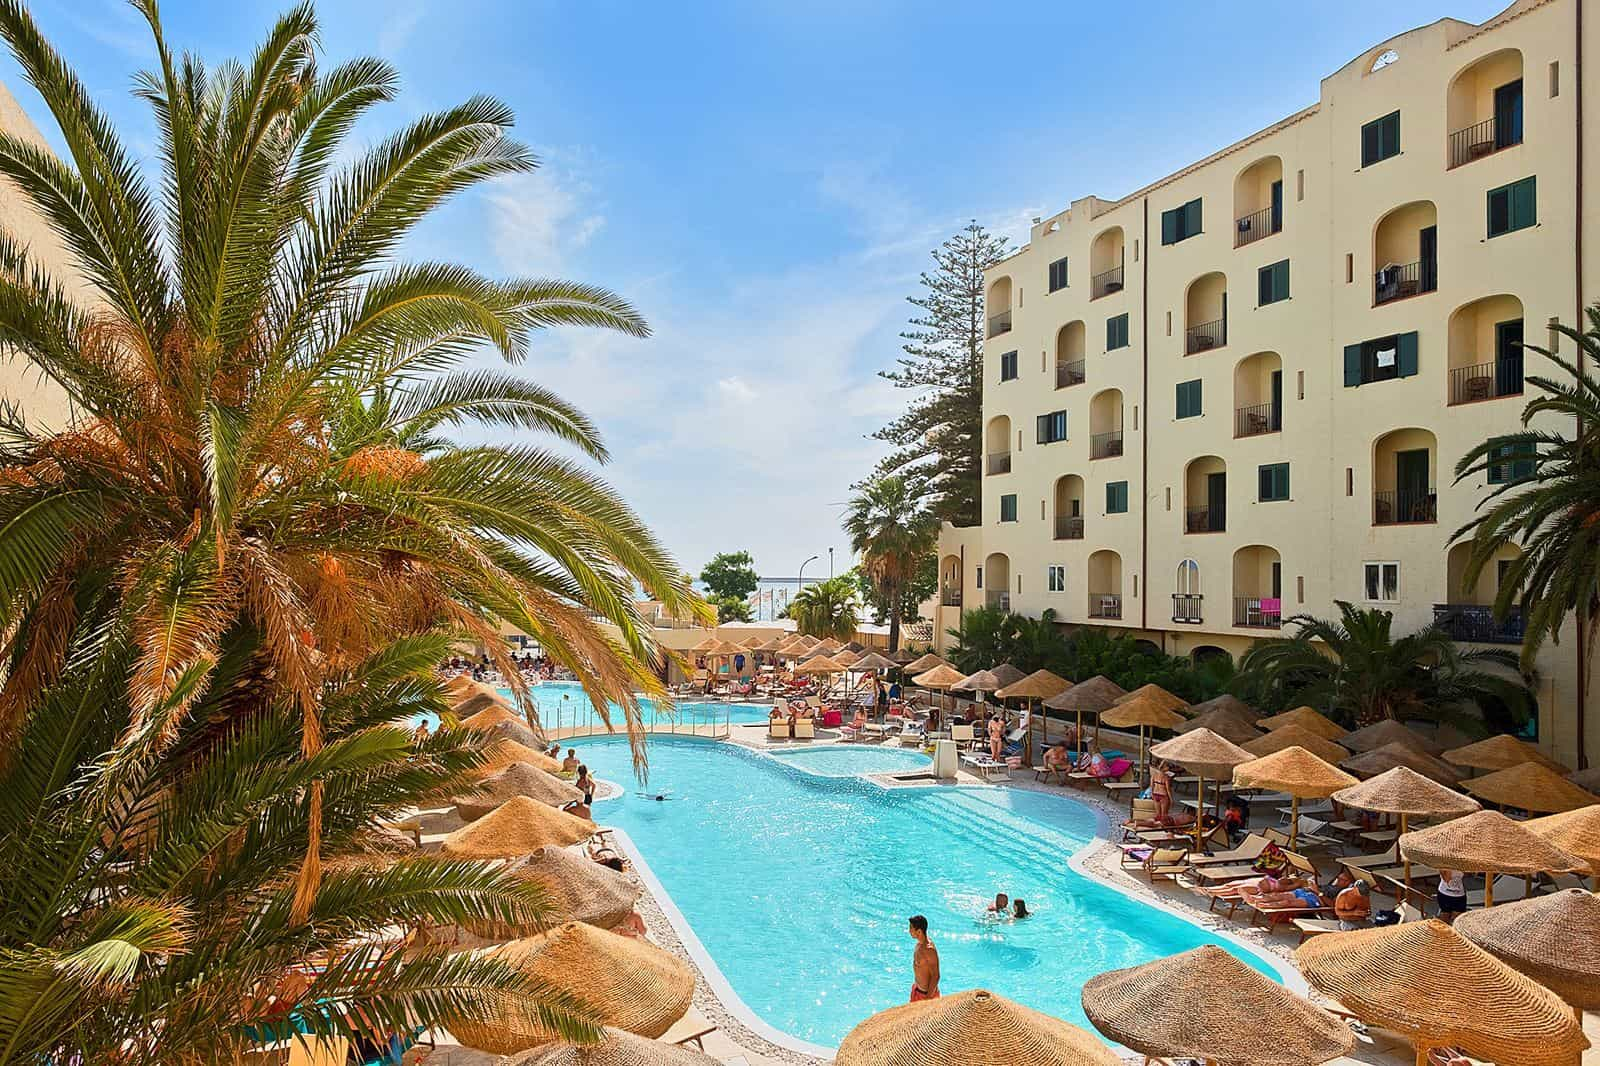 Hopps Hotel in Mazara del Vallo, Sicilië